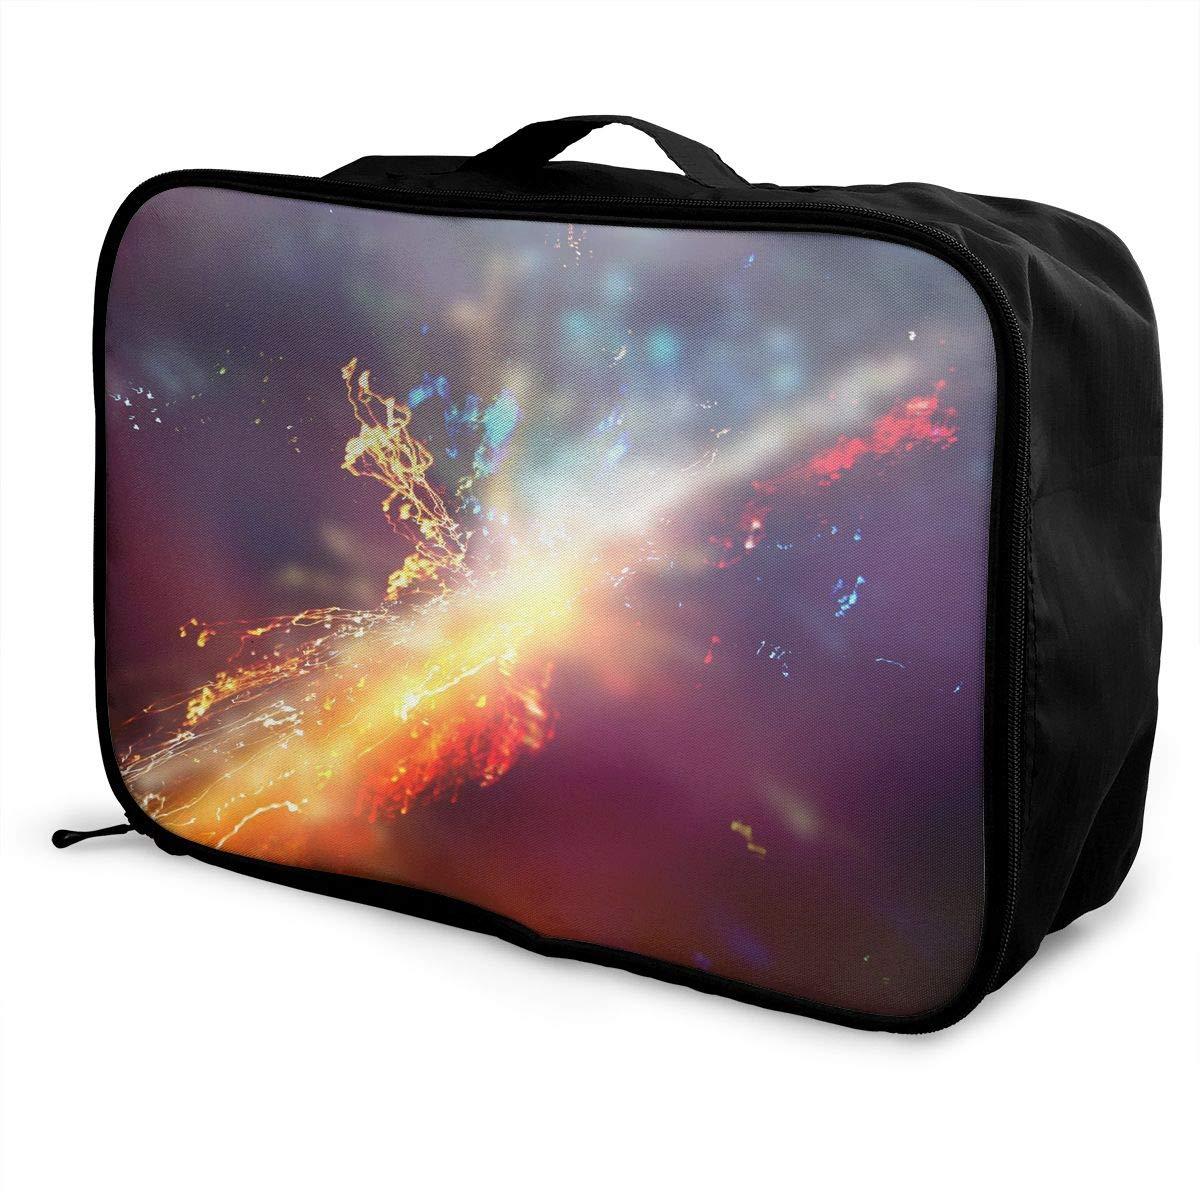 Travel Luggage Duffle Bag Lightweight Portable Handbag Colorful Splash Pattern Large Capacity Waterproof Foldable Storage Tote